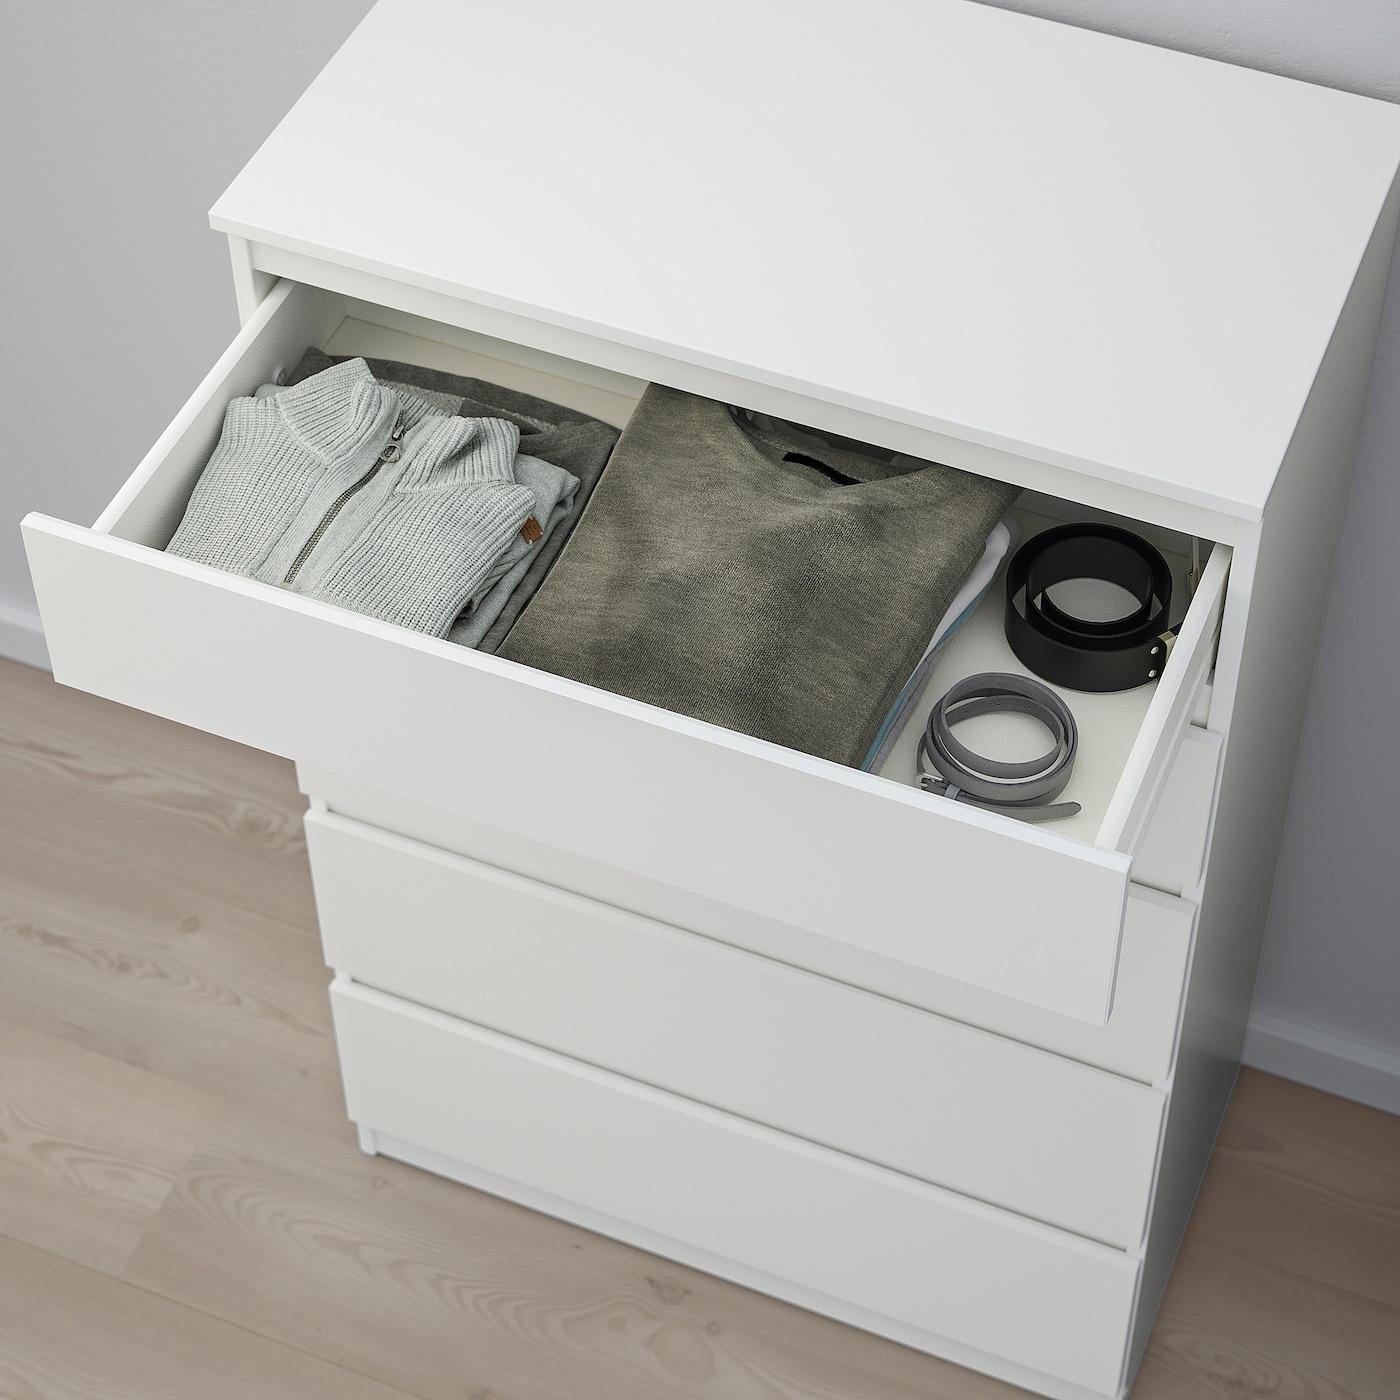 Ikea Kullen Kommode 5 Schubladen 2021